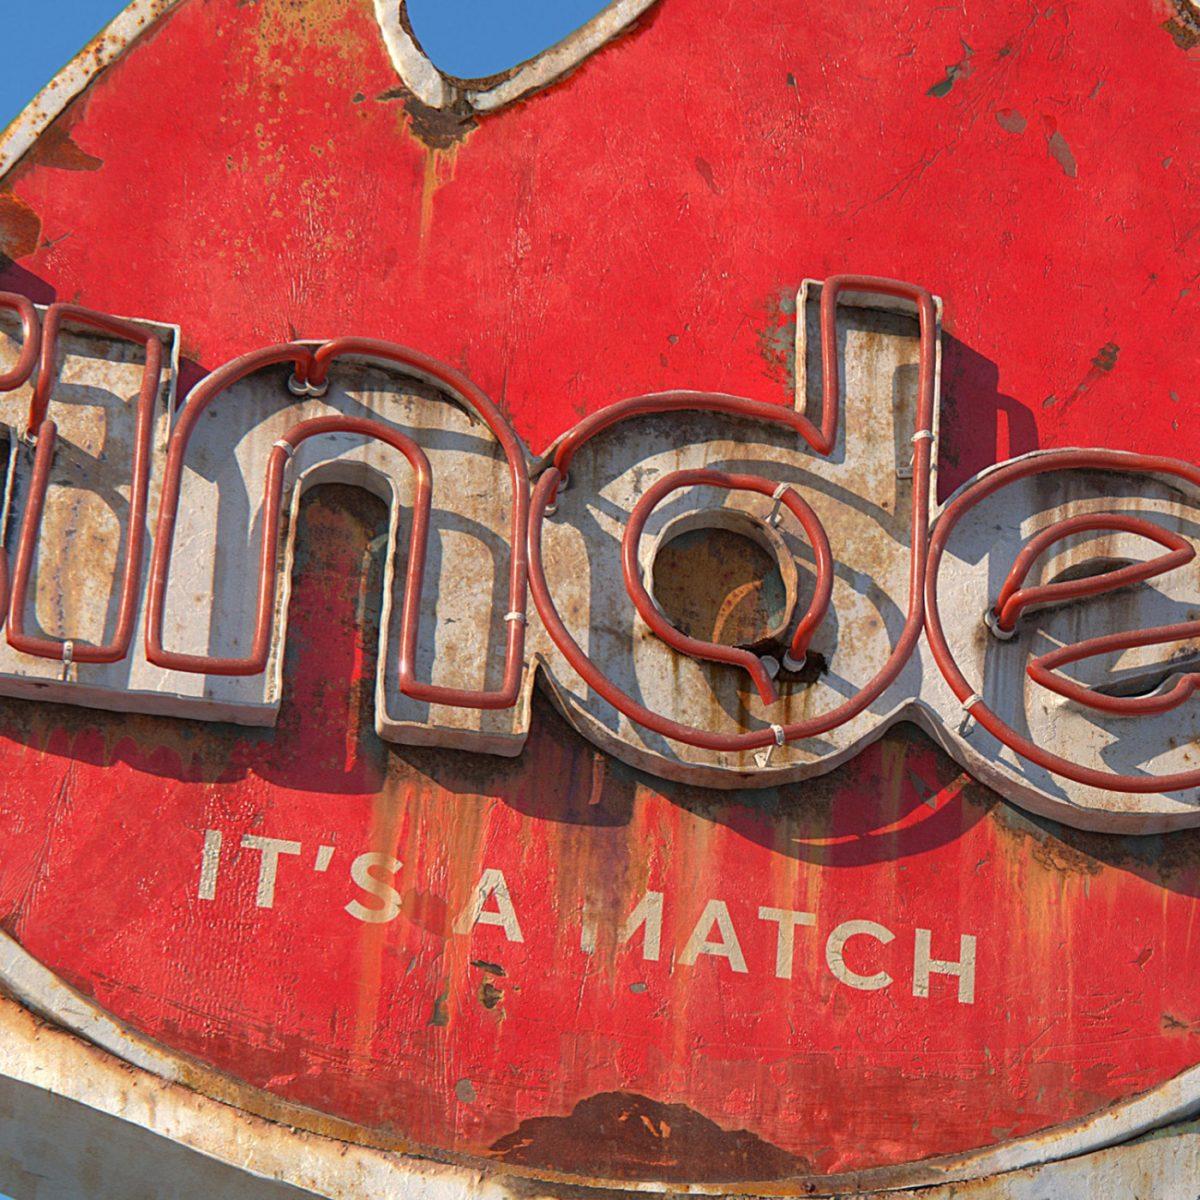 AndreiLacatusu social decay lettres logo enseigne typographie urbain urbex panneau - Social decay : les logos de Twitter, Facebook et Tinder transformés en enseignes vintage